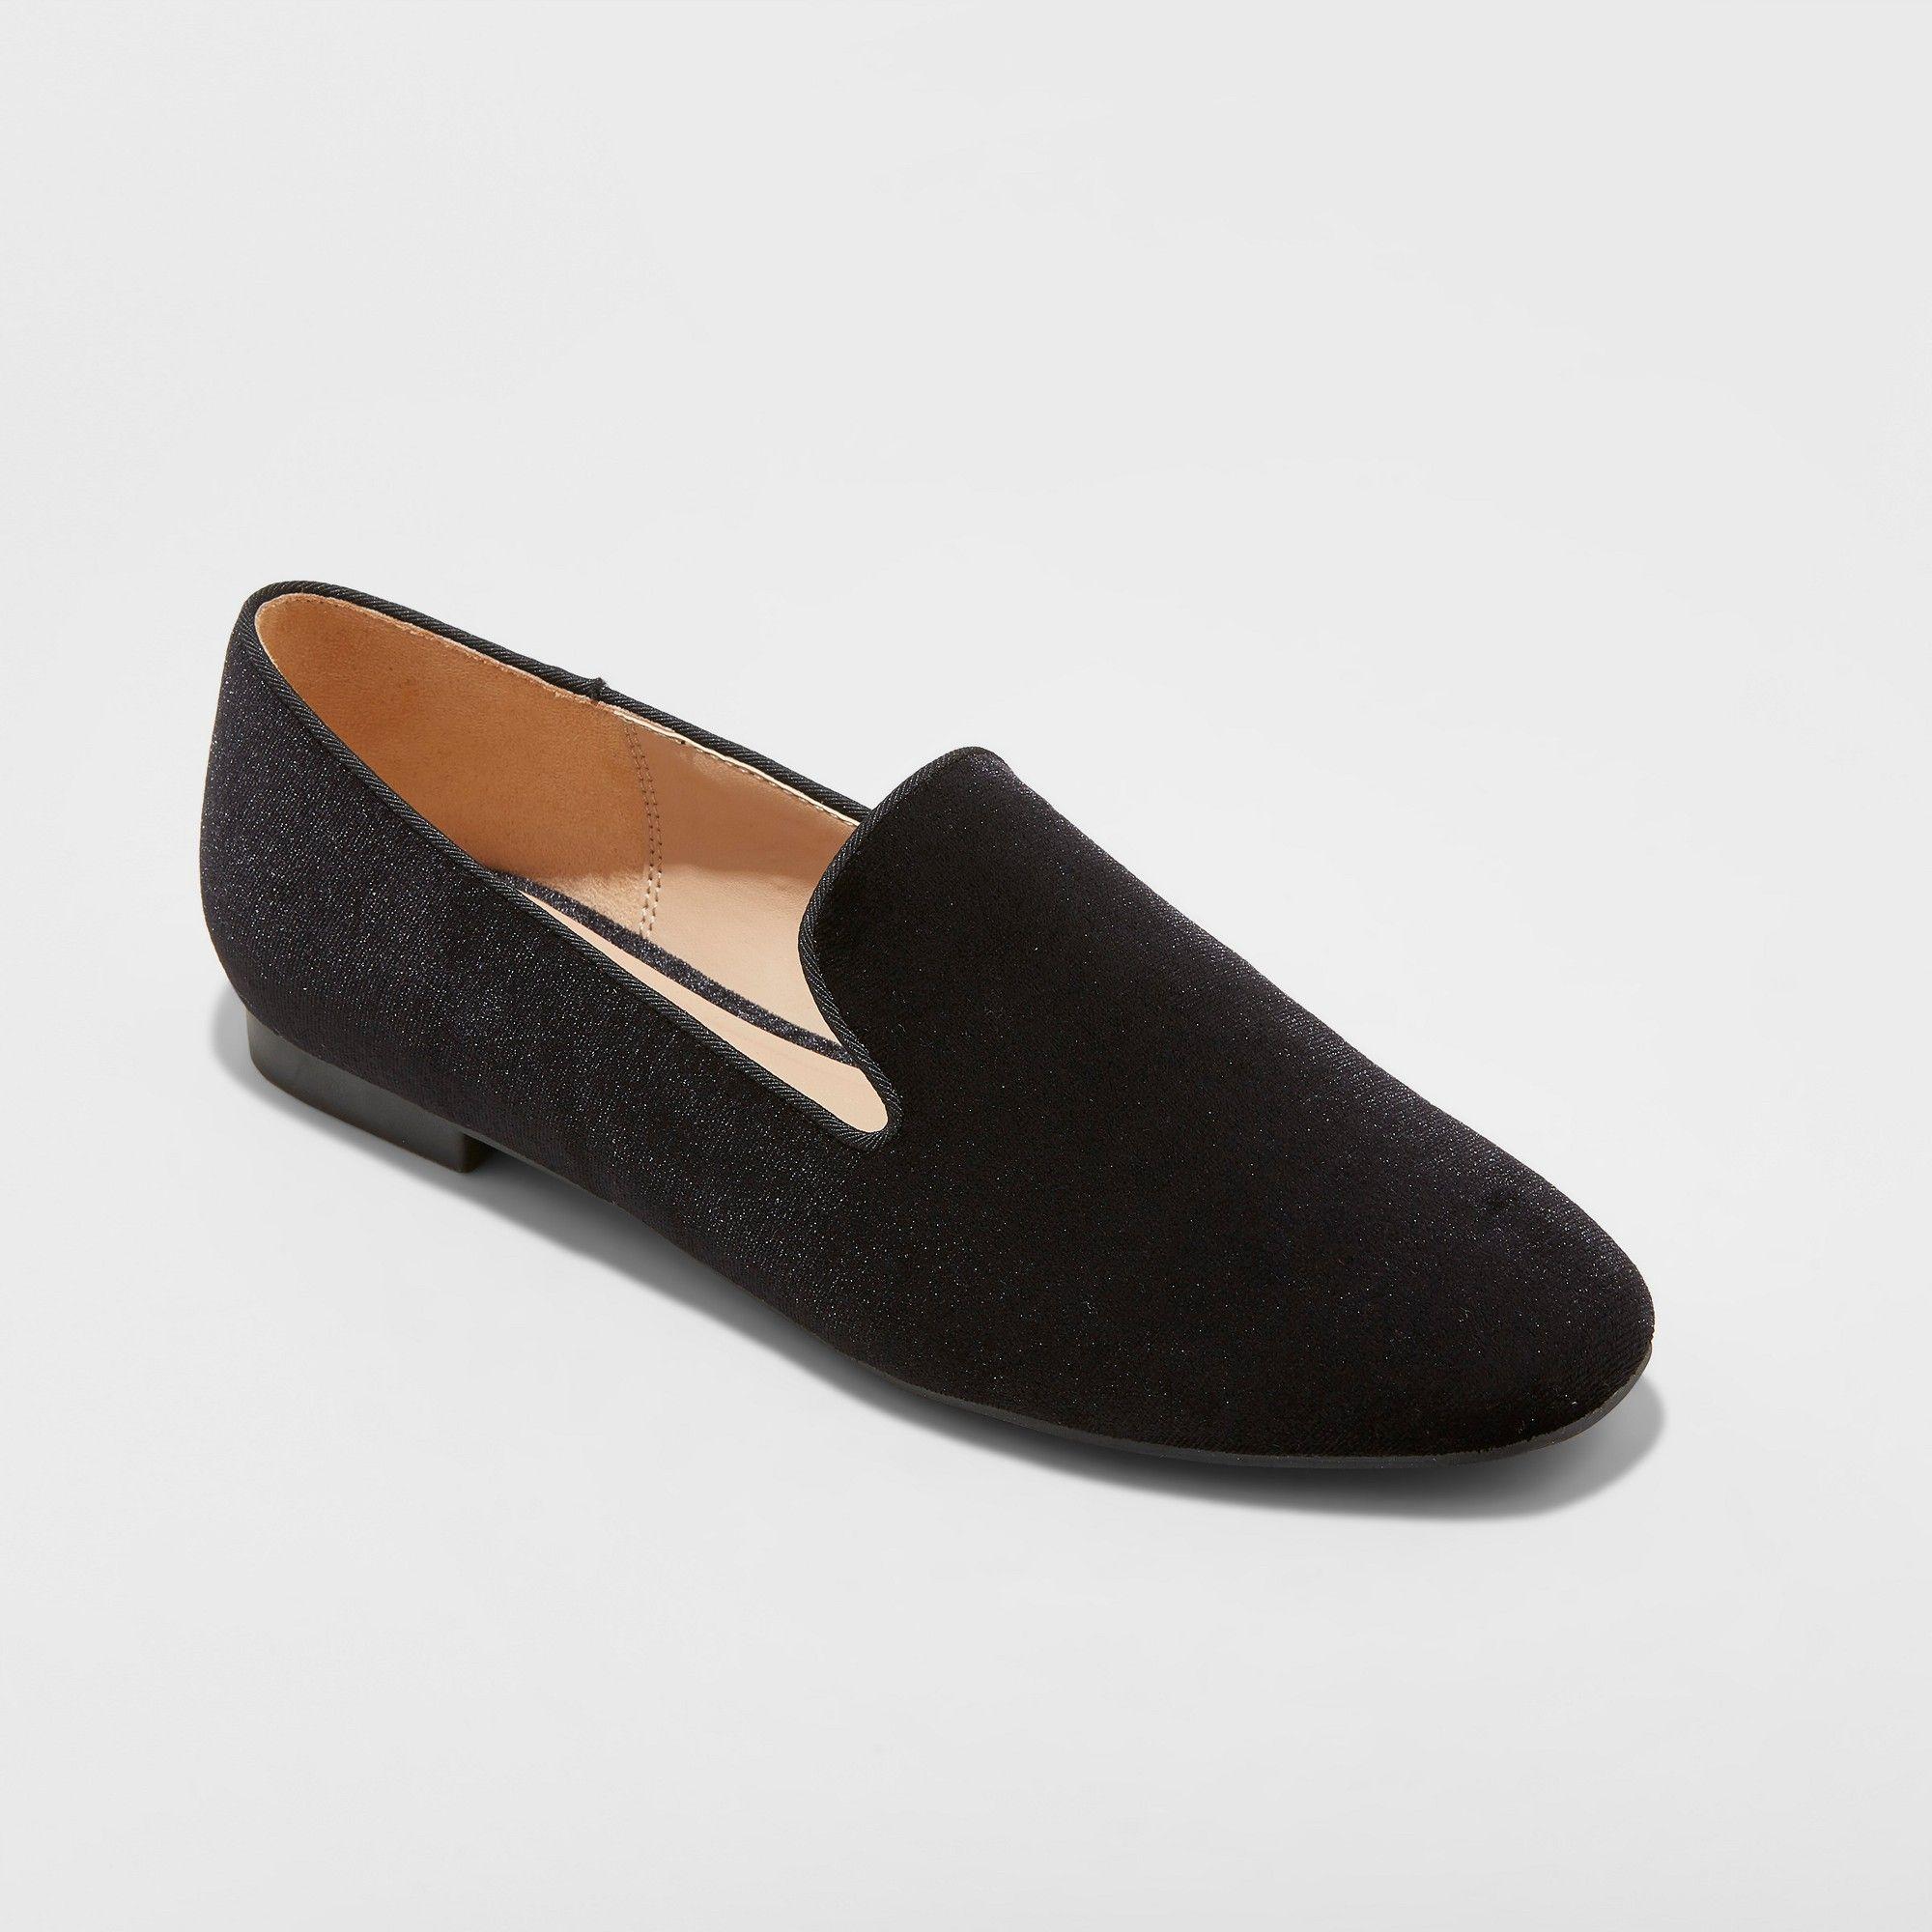 50708465049 Women s Trinity Velvet Smoking Loafers - A New Day Black 6.5 ...